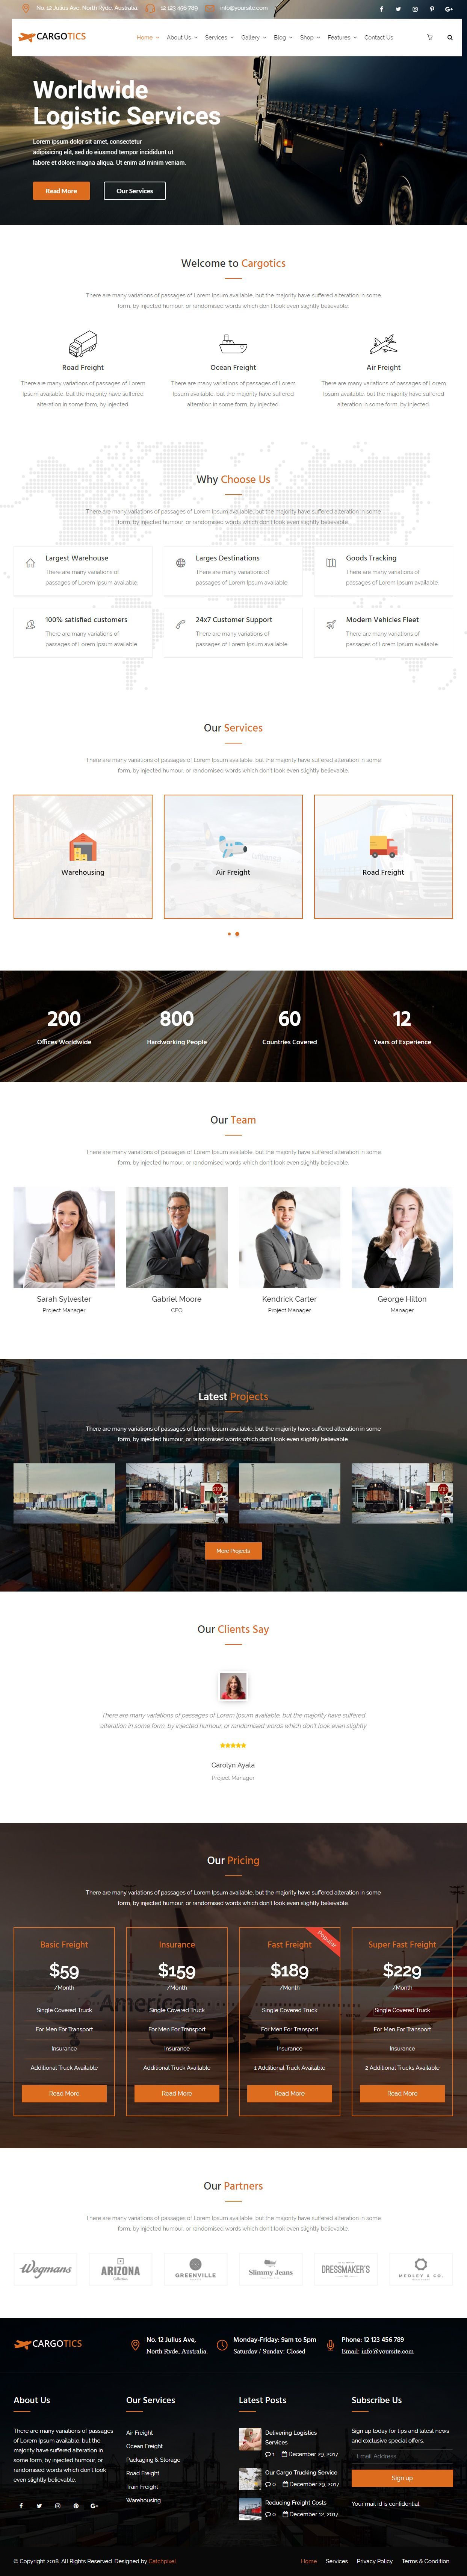 Cargotics is Premium full Responsive Retina WordPress Theme